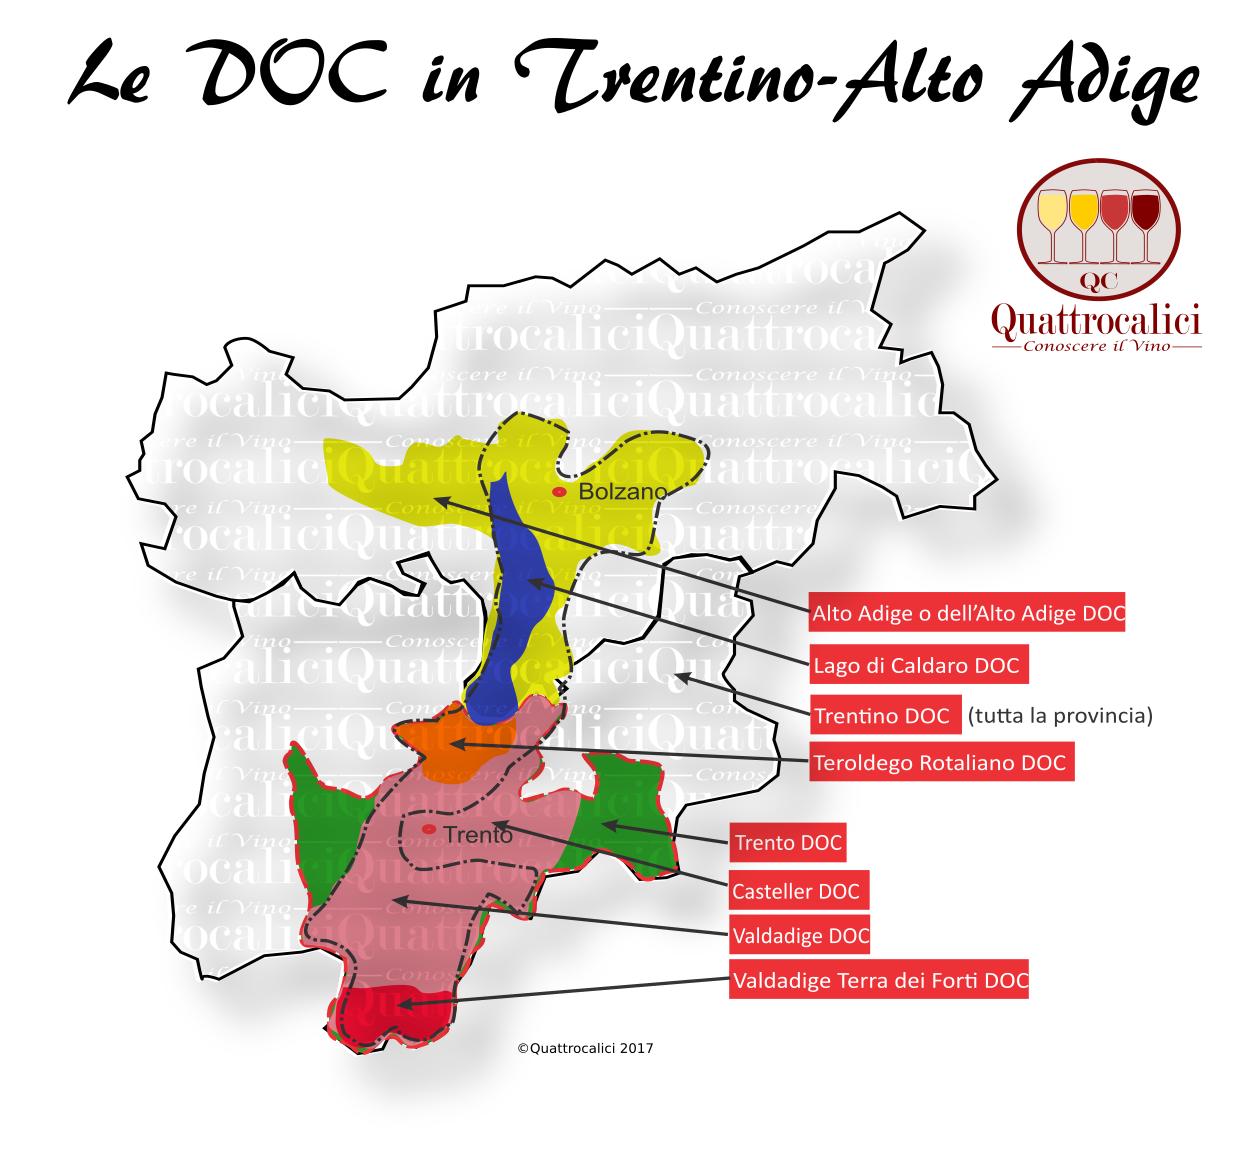 Le DOC in Trentino-Alto Adige